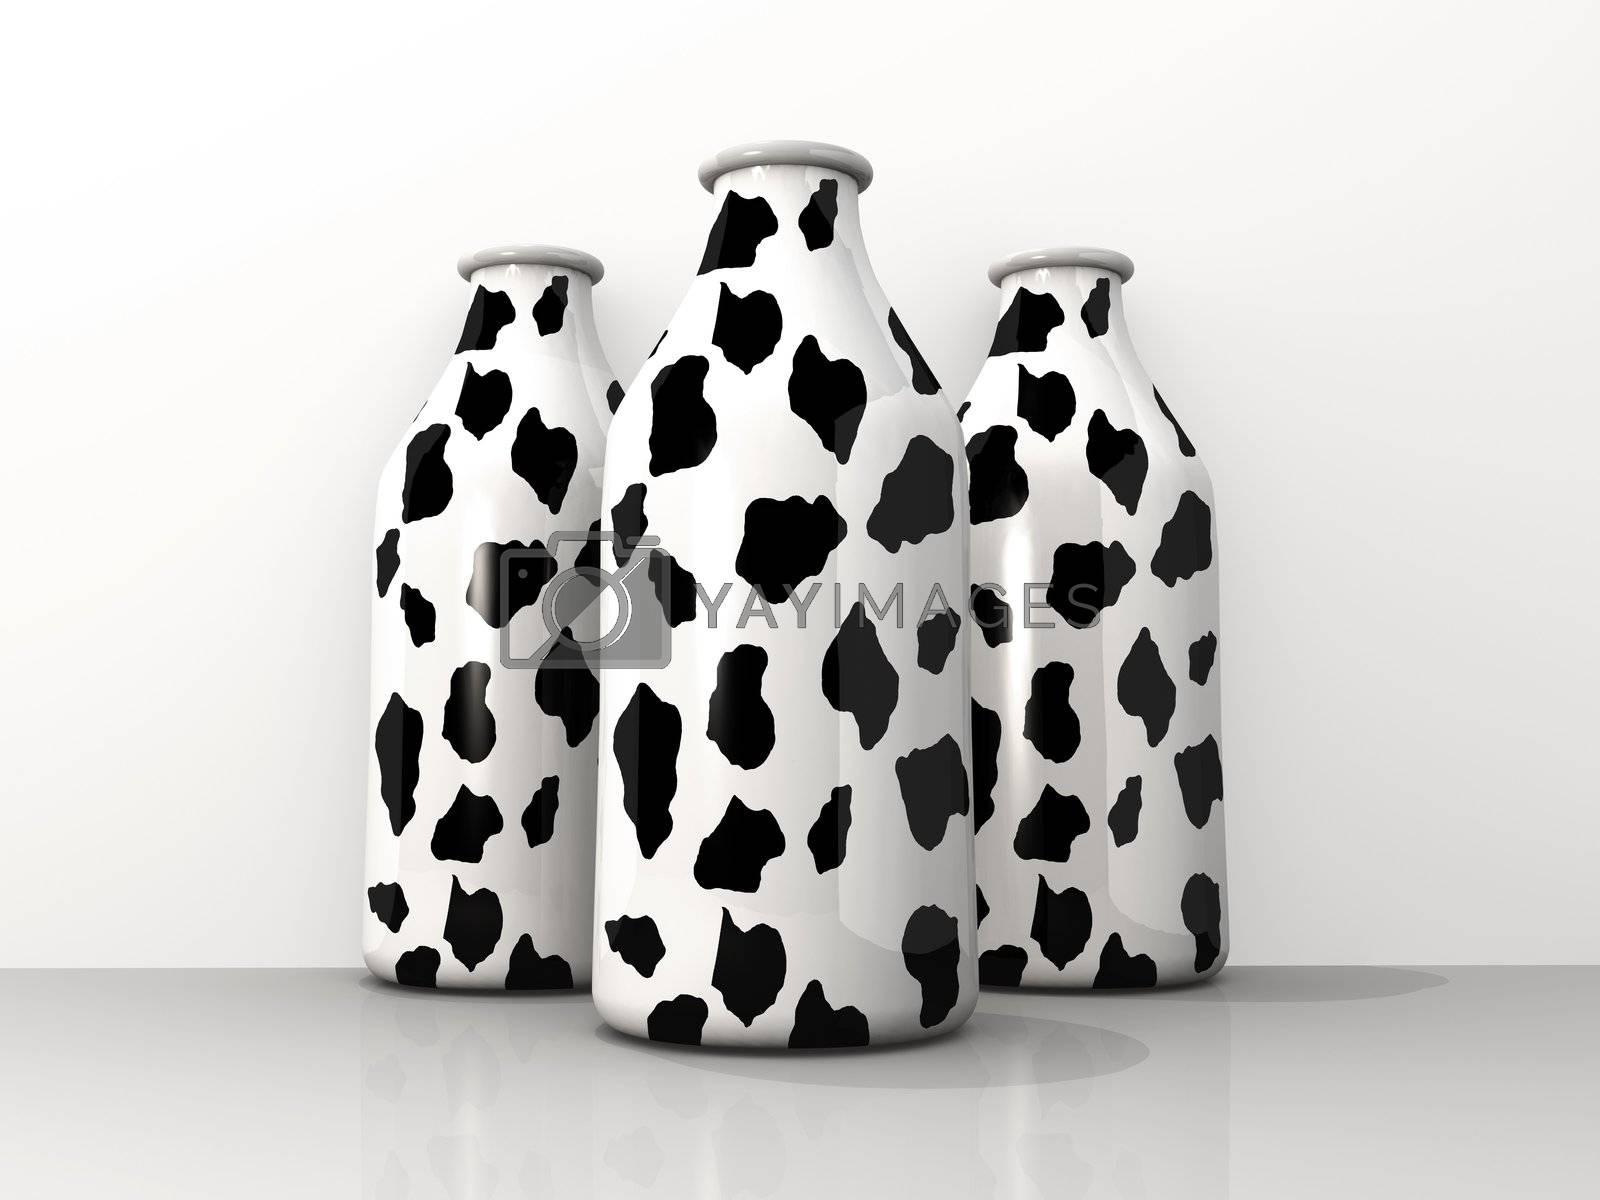 Milk Bottles by 3pod